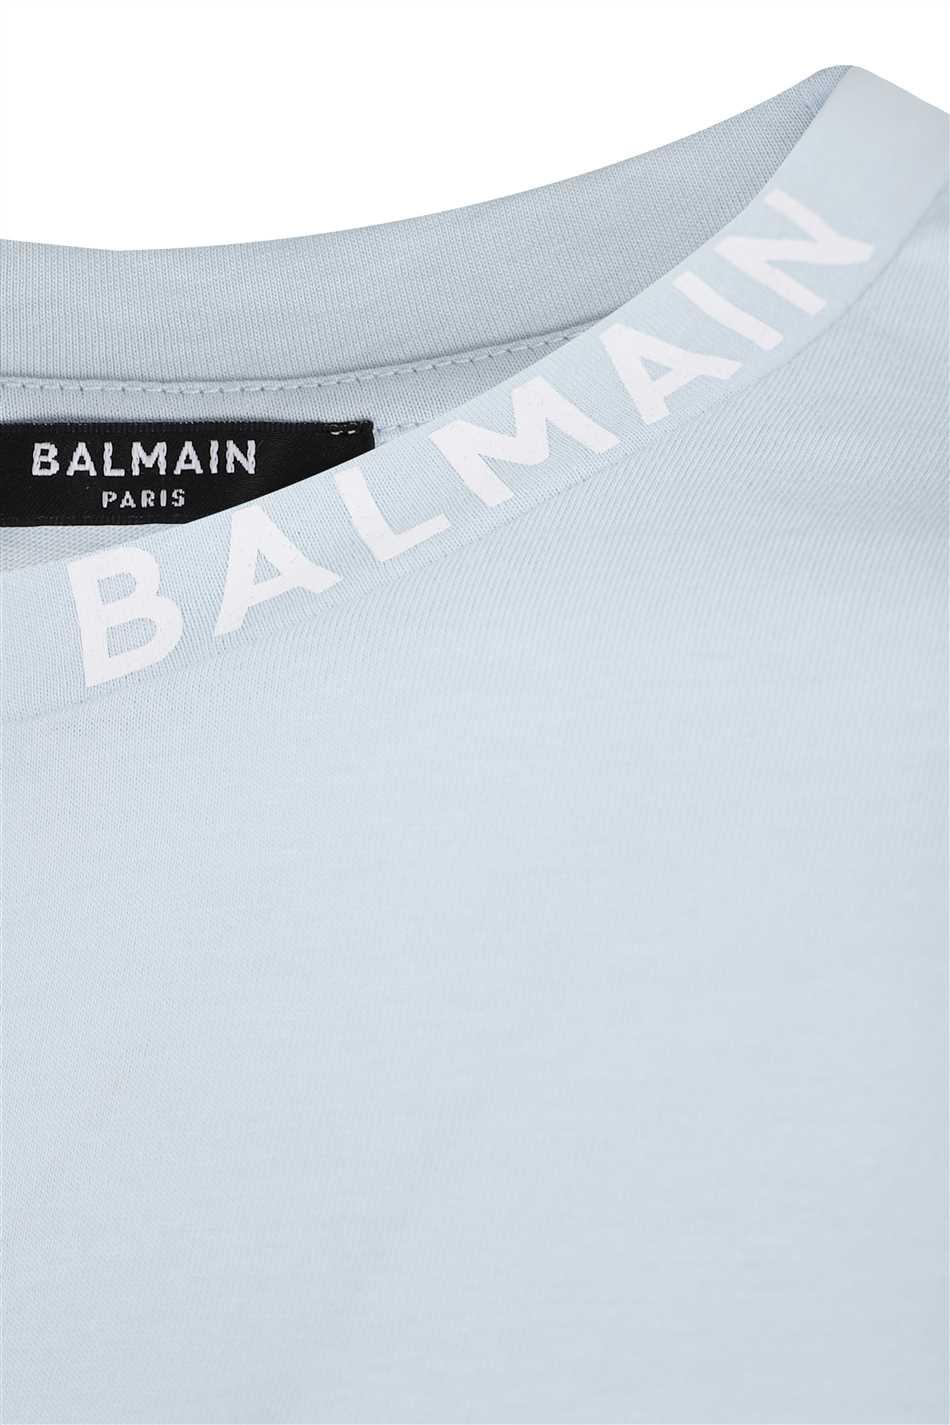 Balmain WH1EF006B129 PRINTED COLLAR T-shirt 3